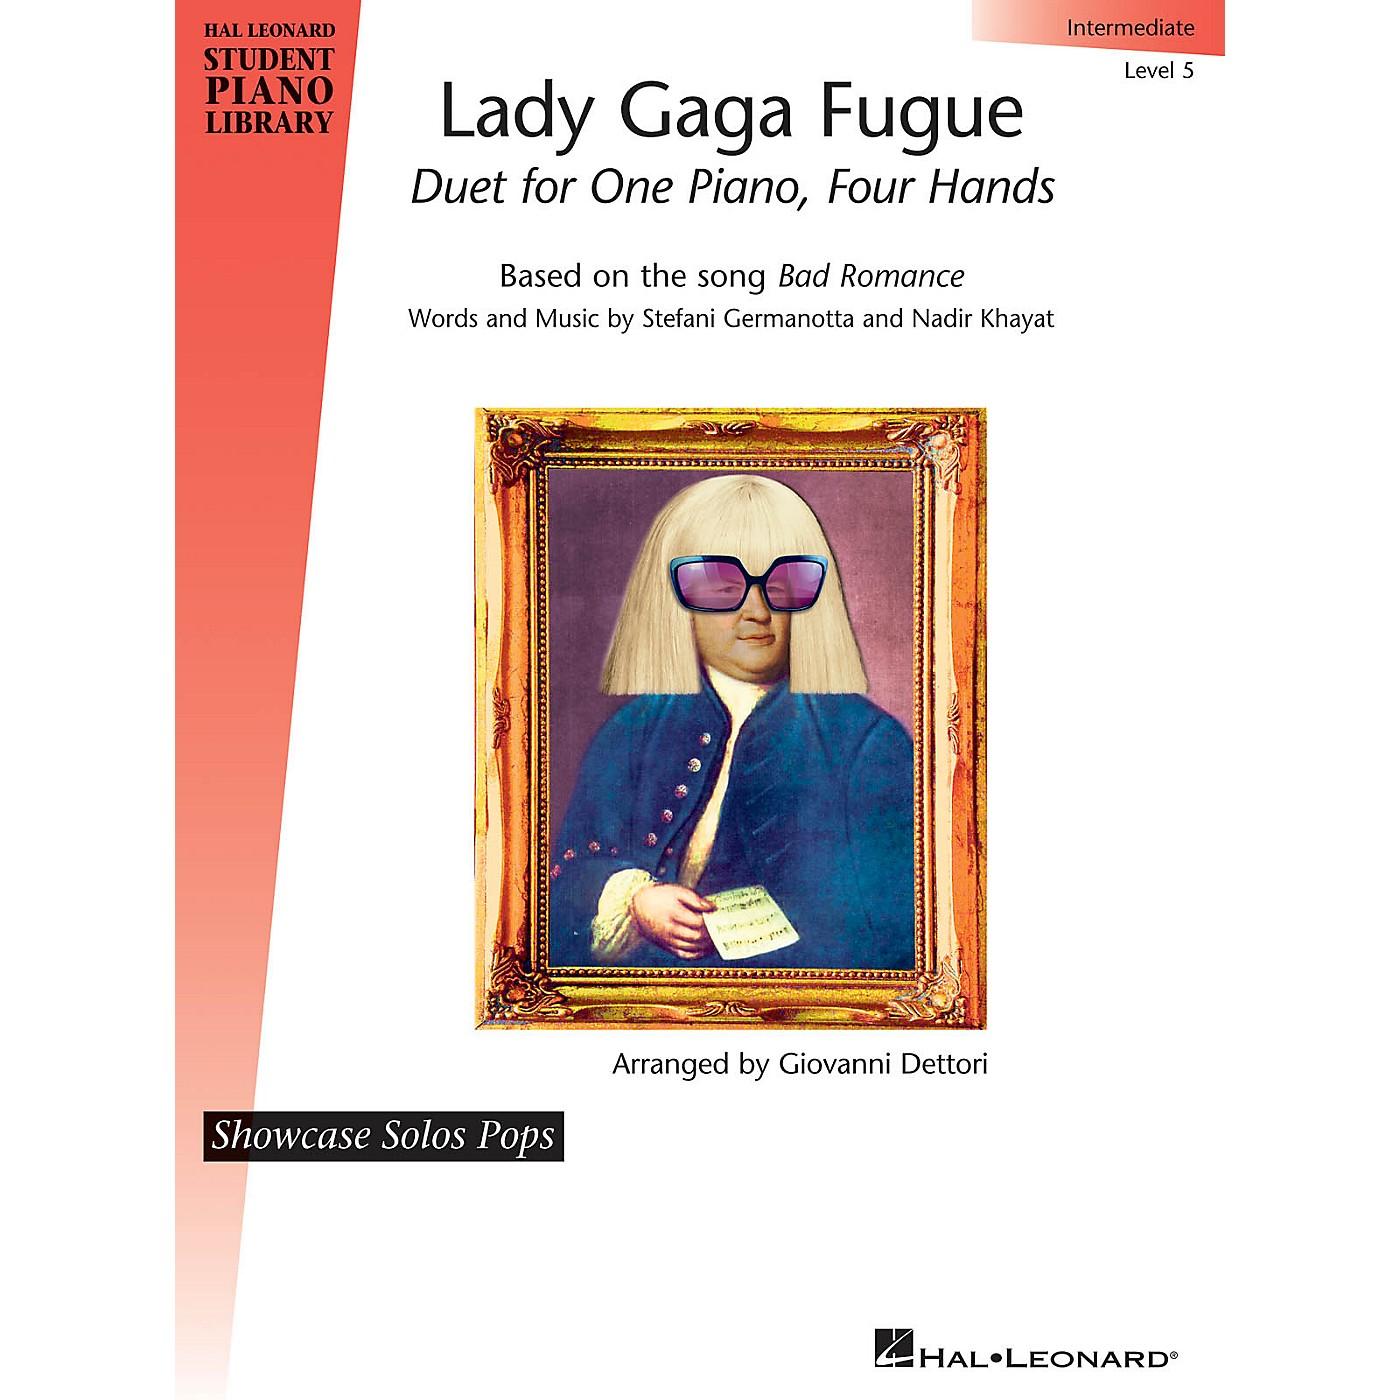 Hal Leonard Lady Gaga Fugue Piano Library Series Performed by Lady Gaga (Level 5) thumbnail